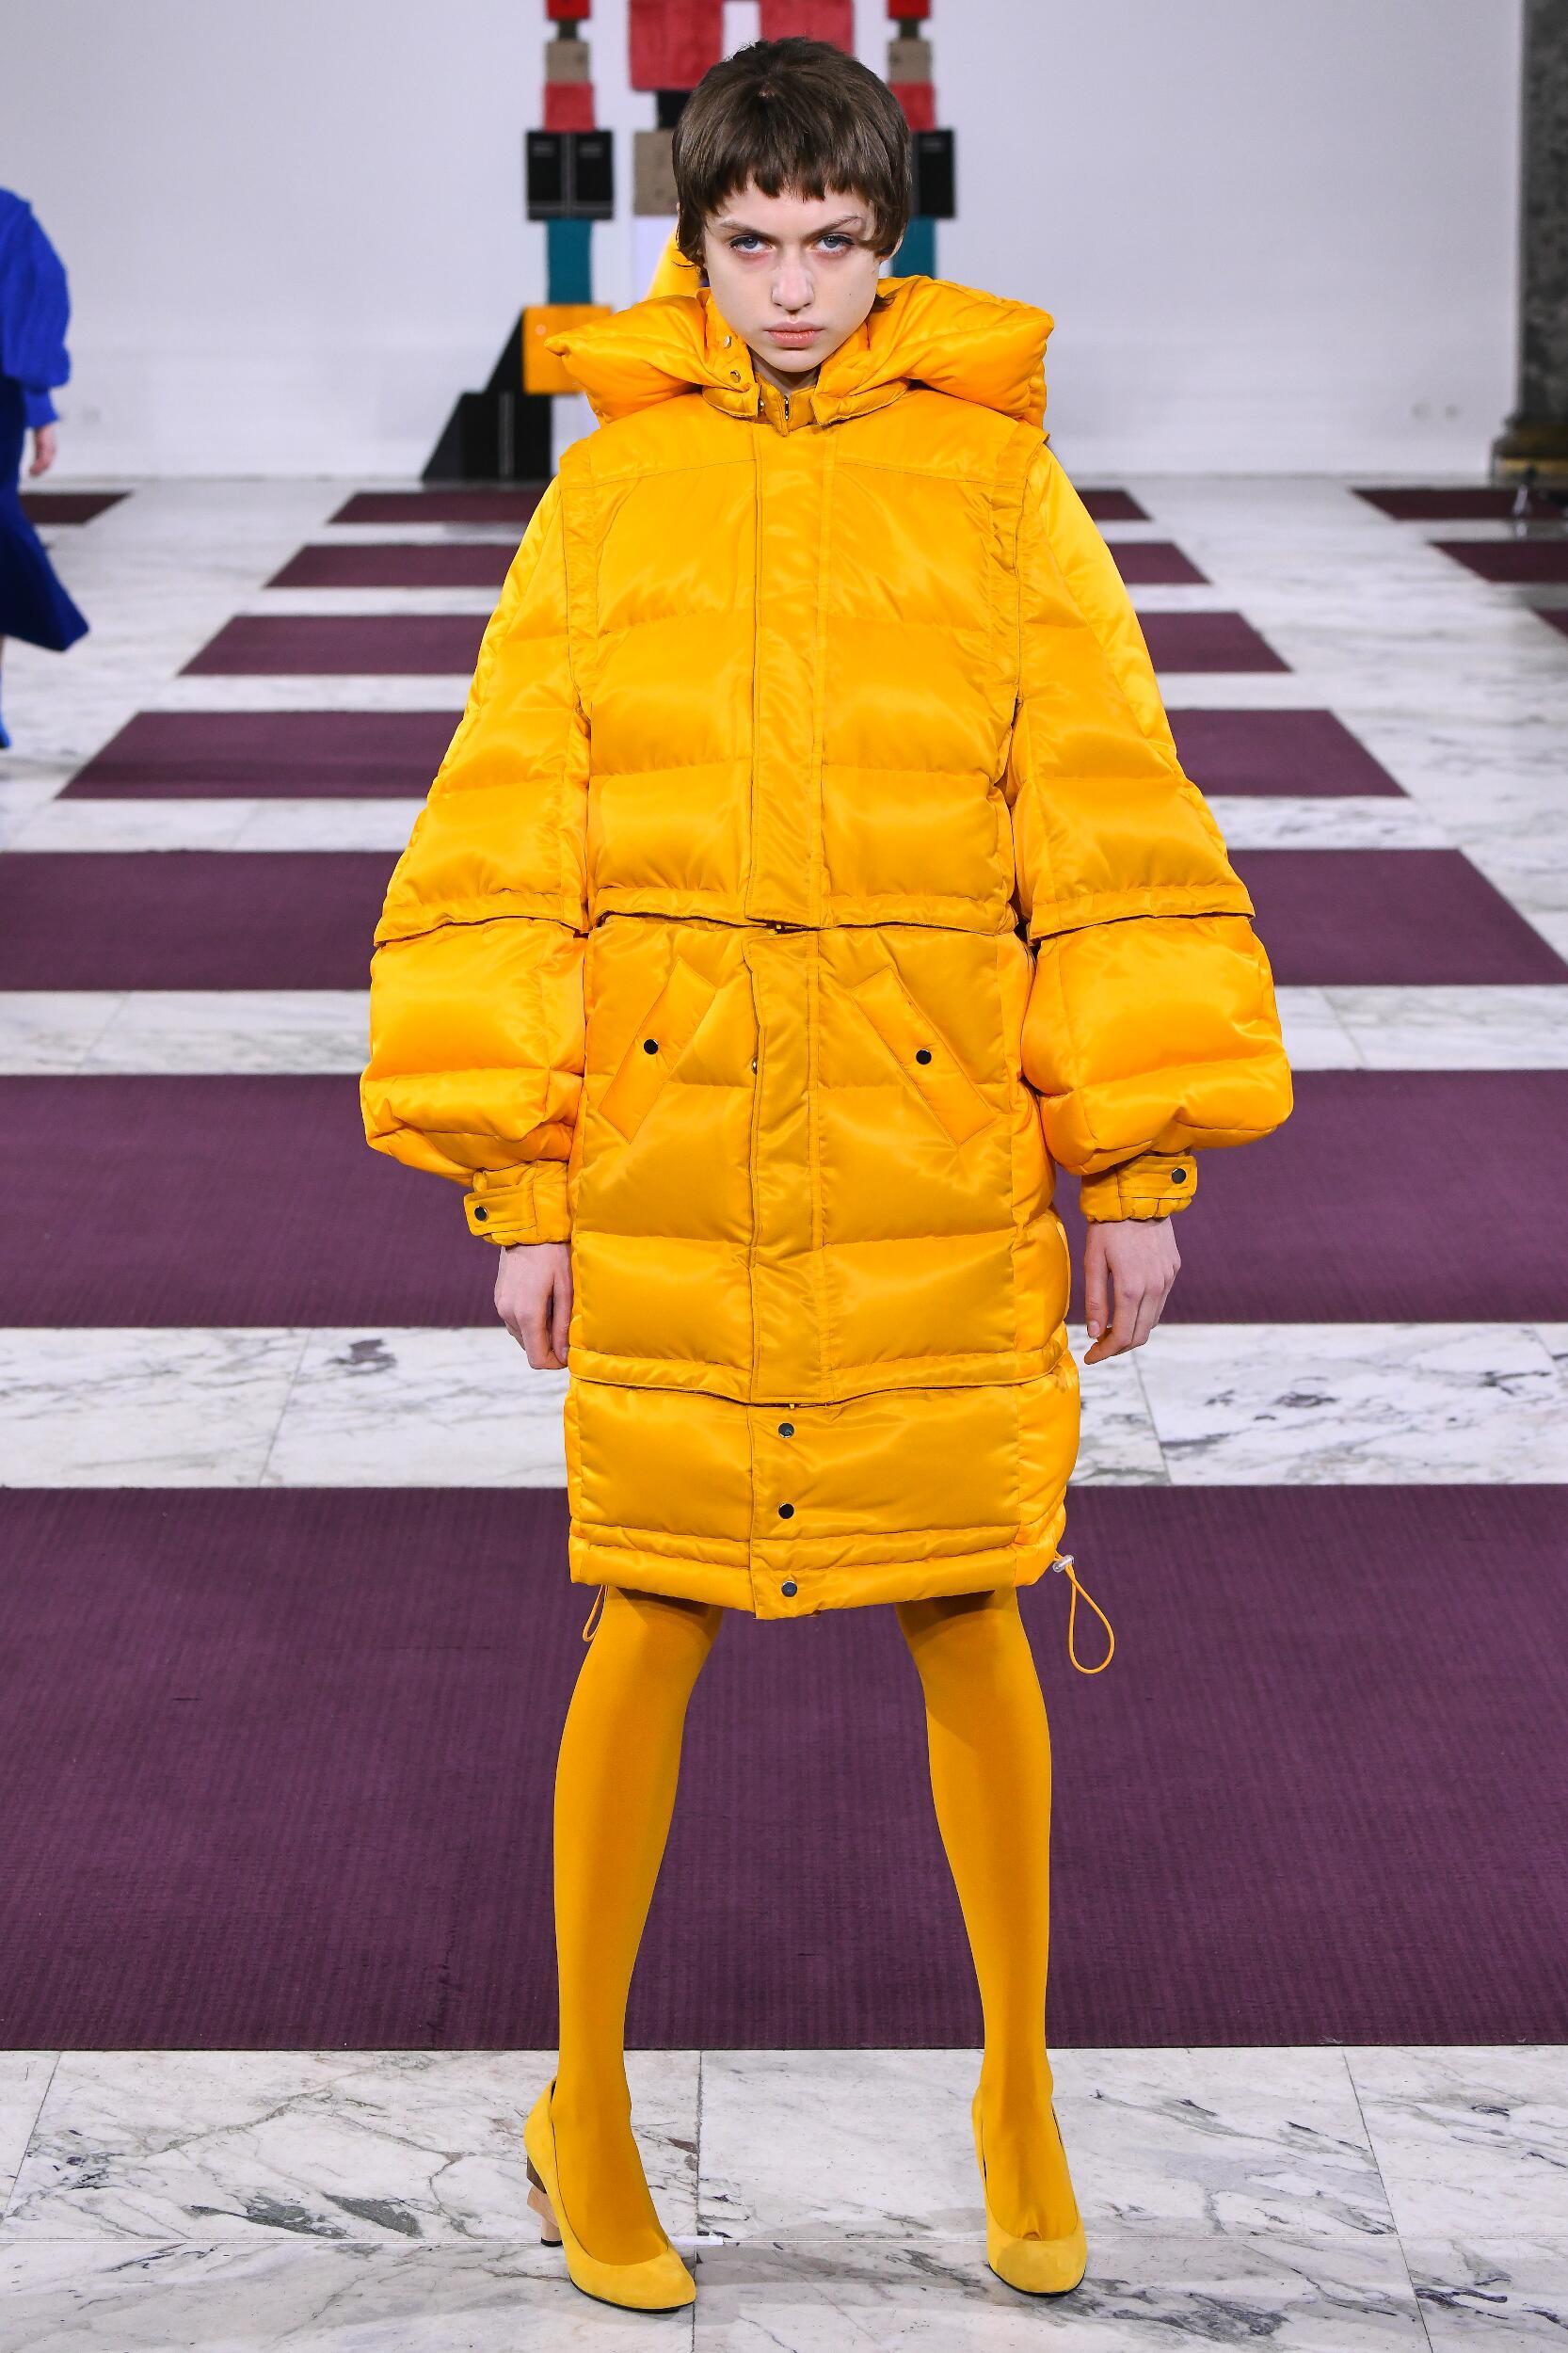 Fashion Show Woman Model Anrealage Catwalk